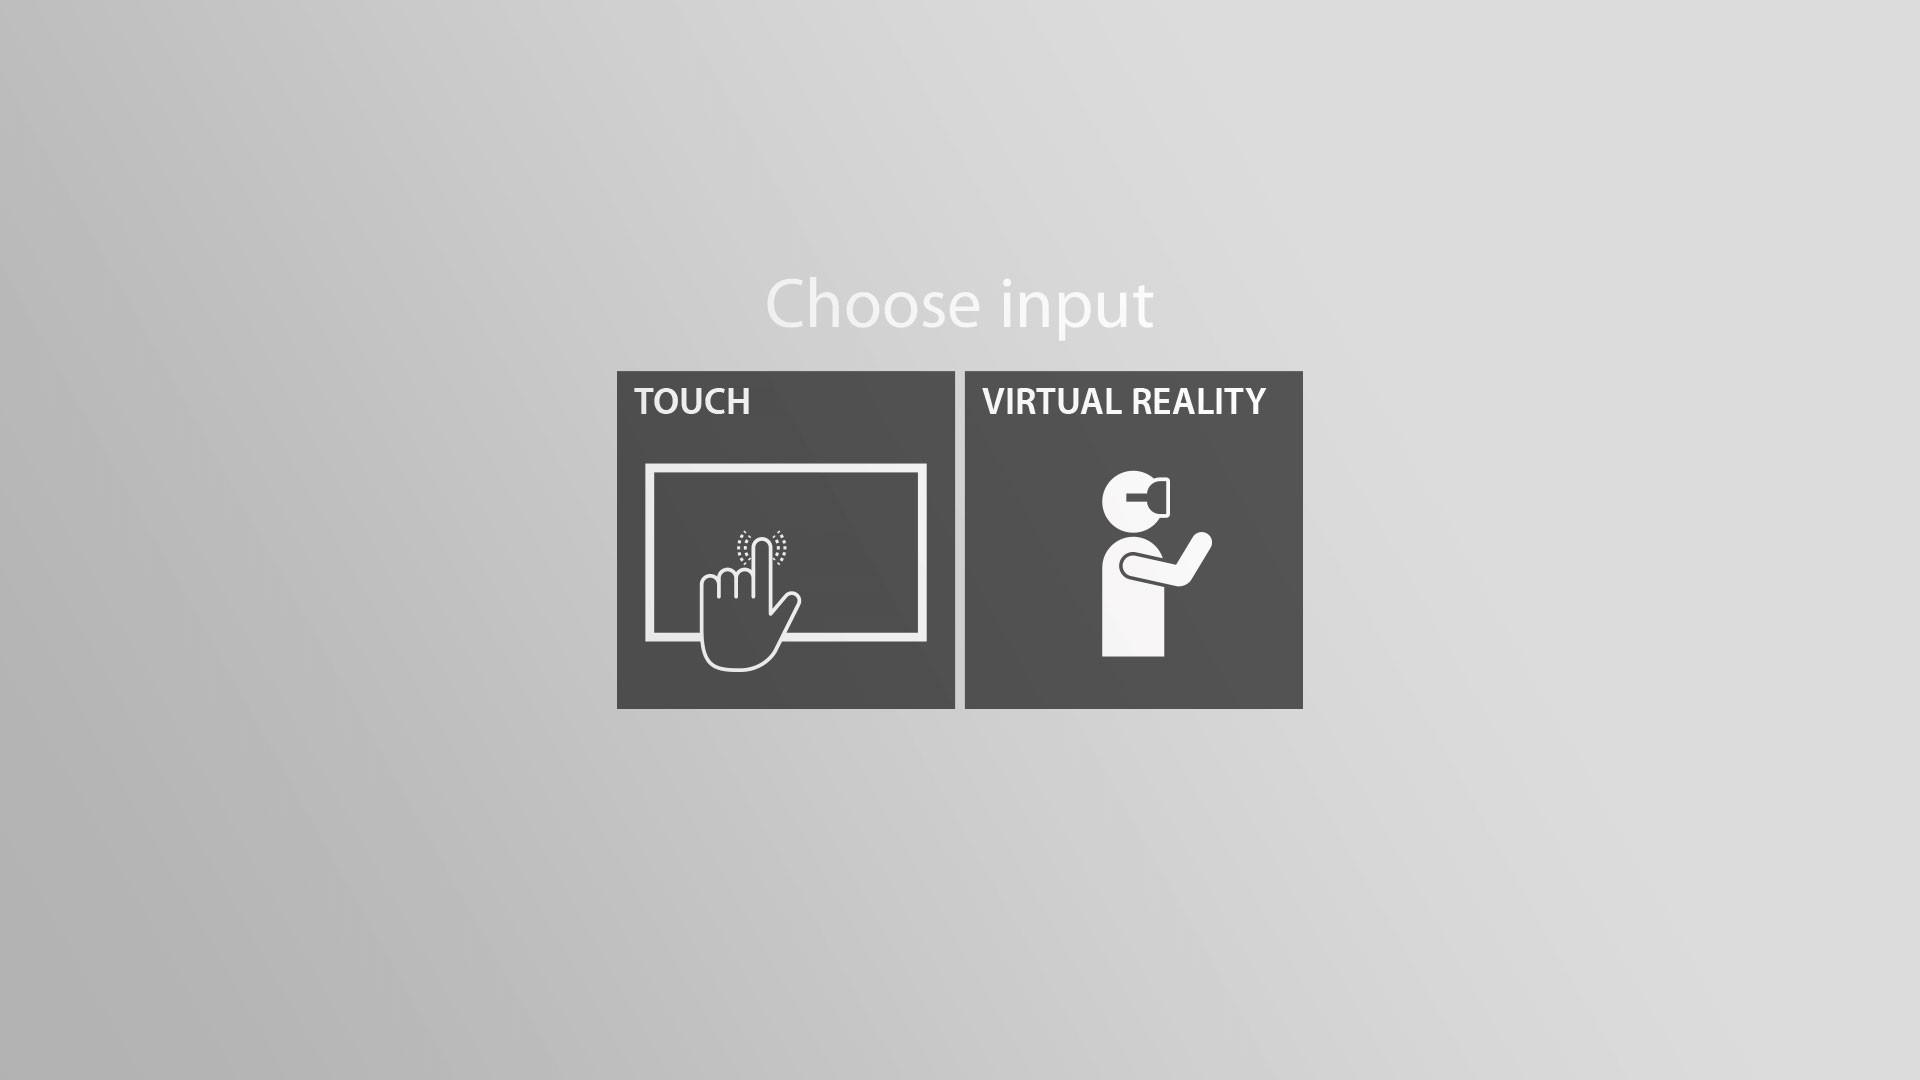 Evokon_VRprojektTouchscreen_LightboxSize_sliderimage1